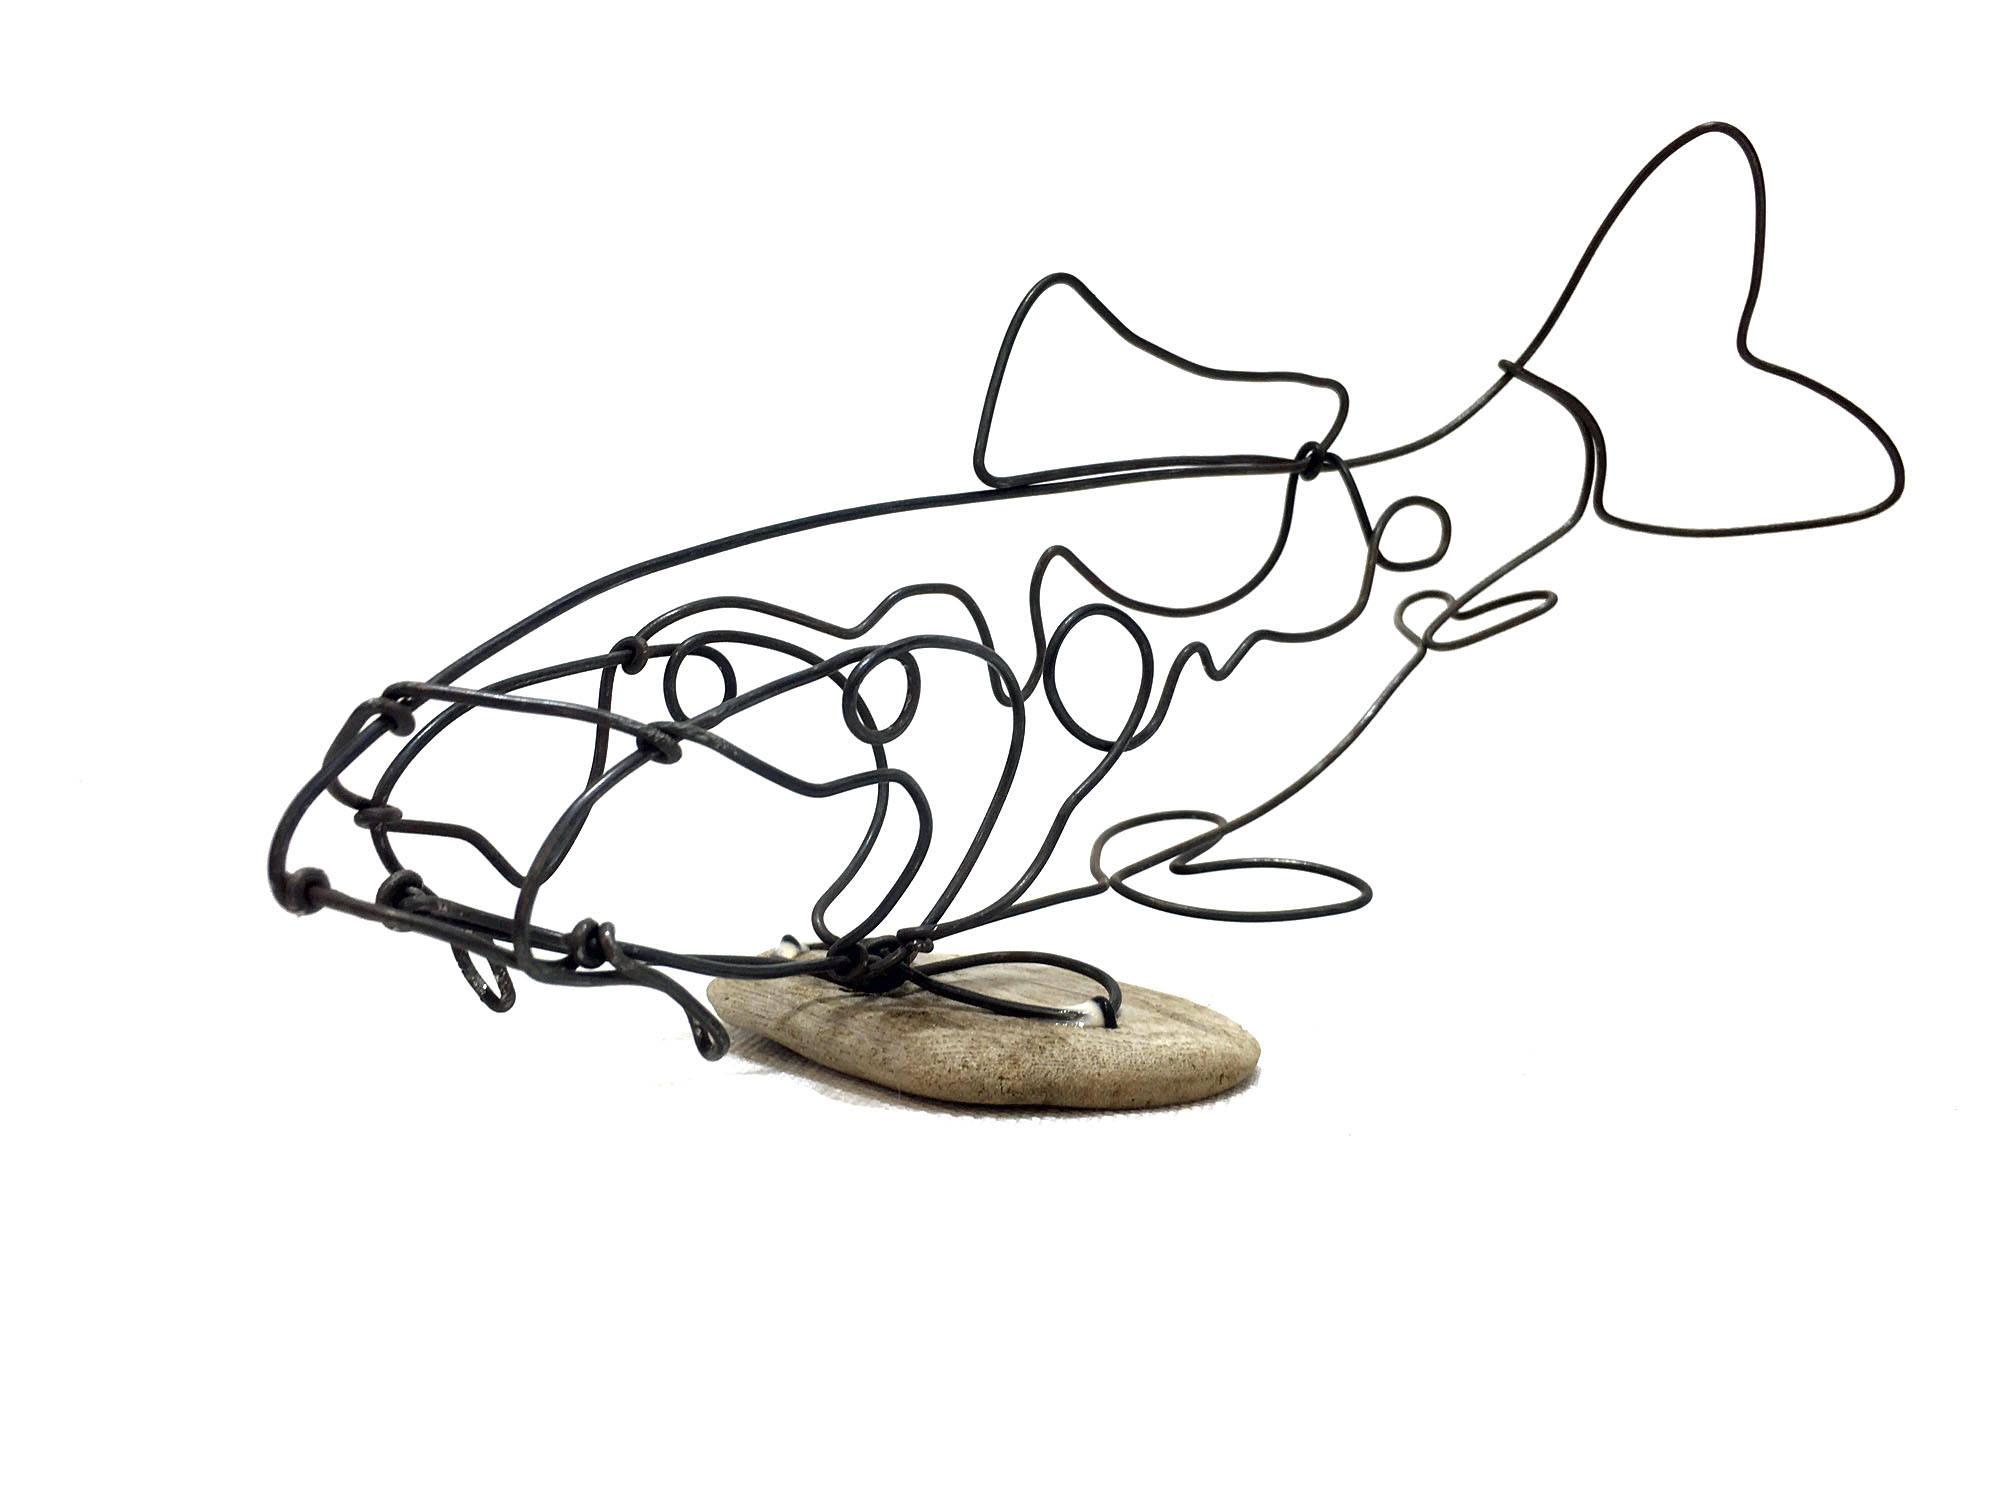 2016x1512 koi wire sculpture carp fish wire art minimal wire design etsy